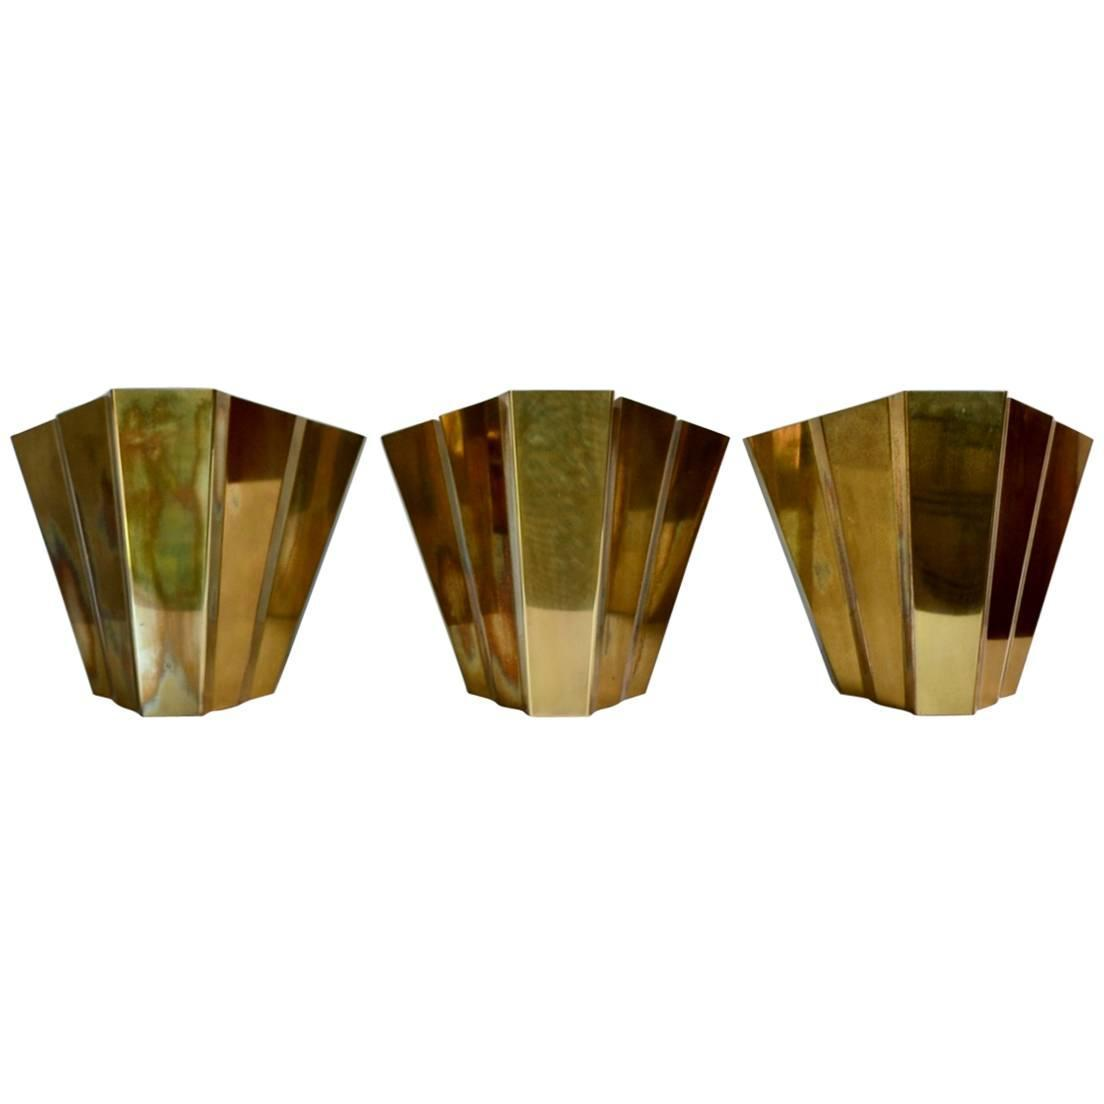 Art Deco Style Wall Sconces : Set of Three Art Deco Style Italian Brass Wall Sconces, 1980s at 1stdibs